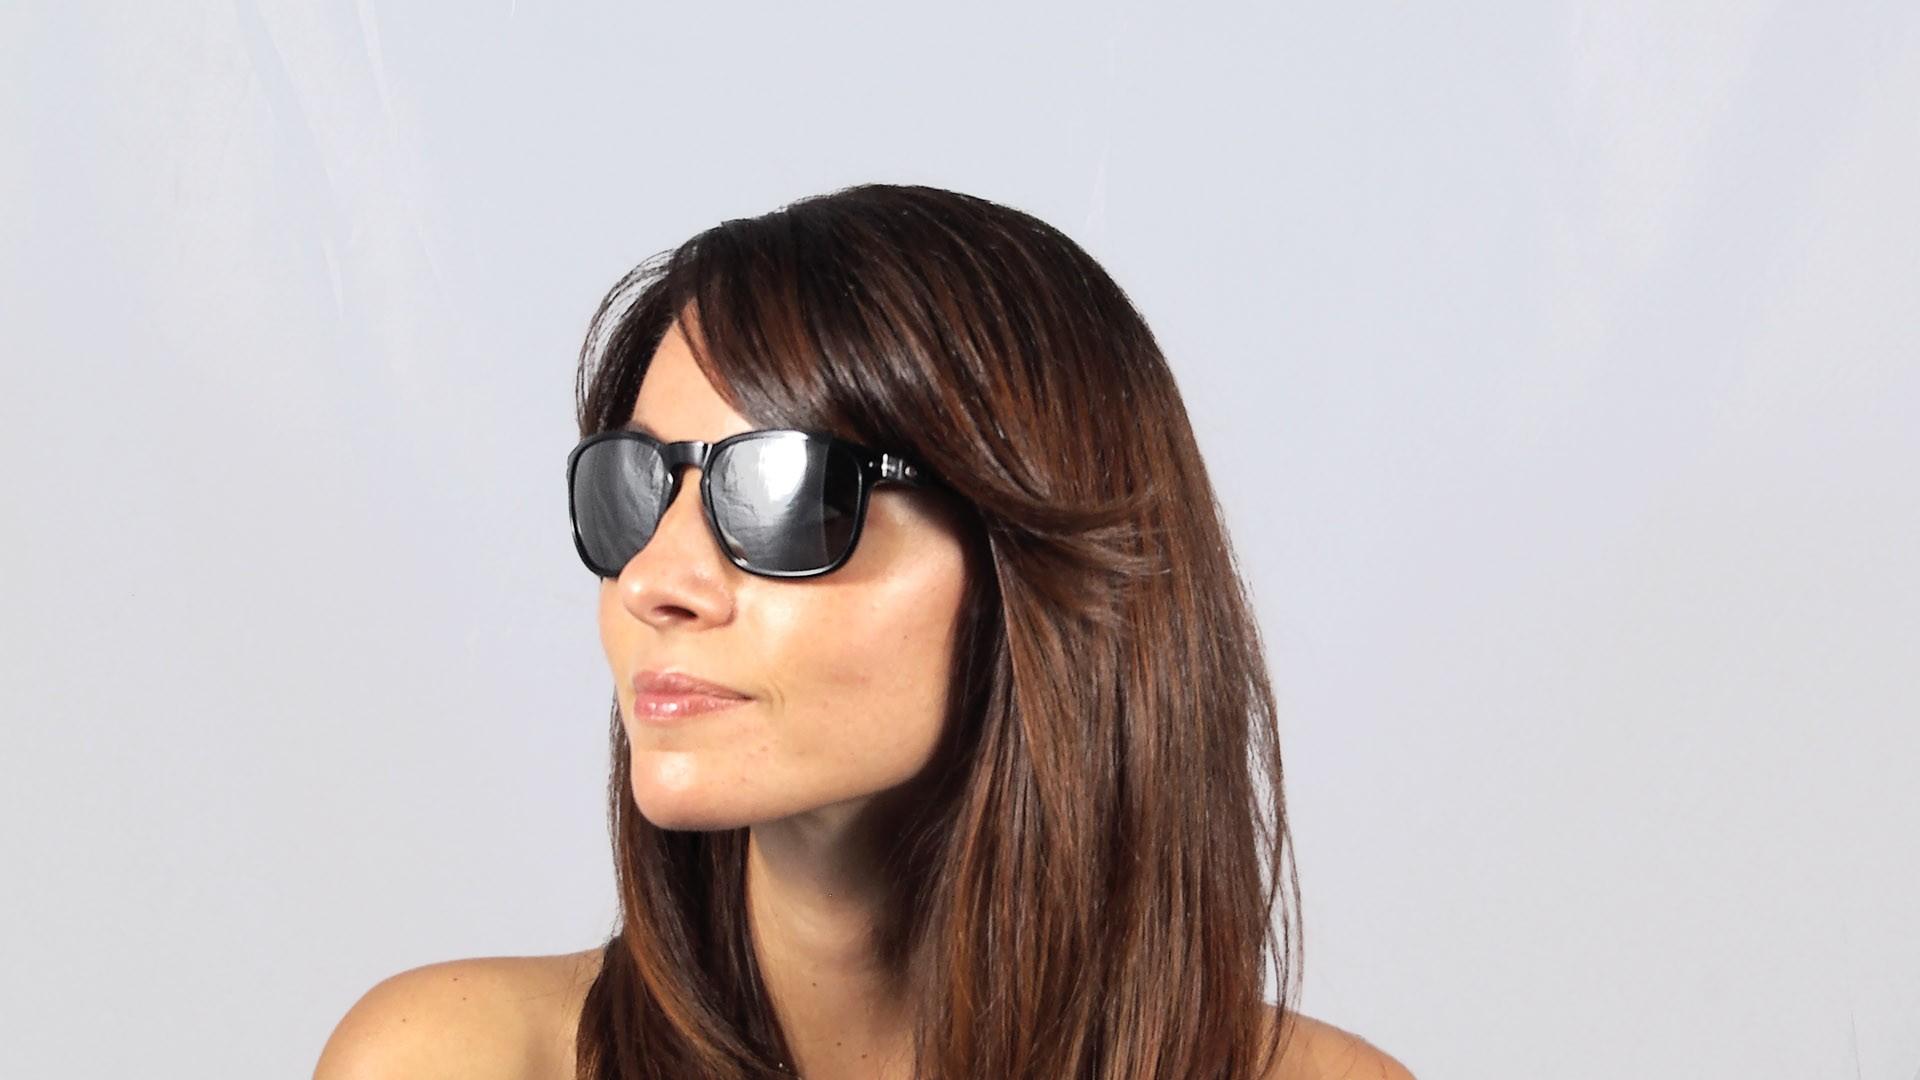 Shaun White Oakley Sunglasses  enduro shaun white signature series black oo9223 03 55 visiofactory